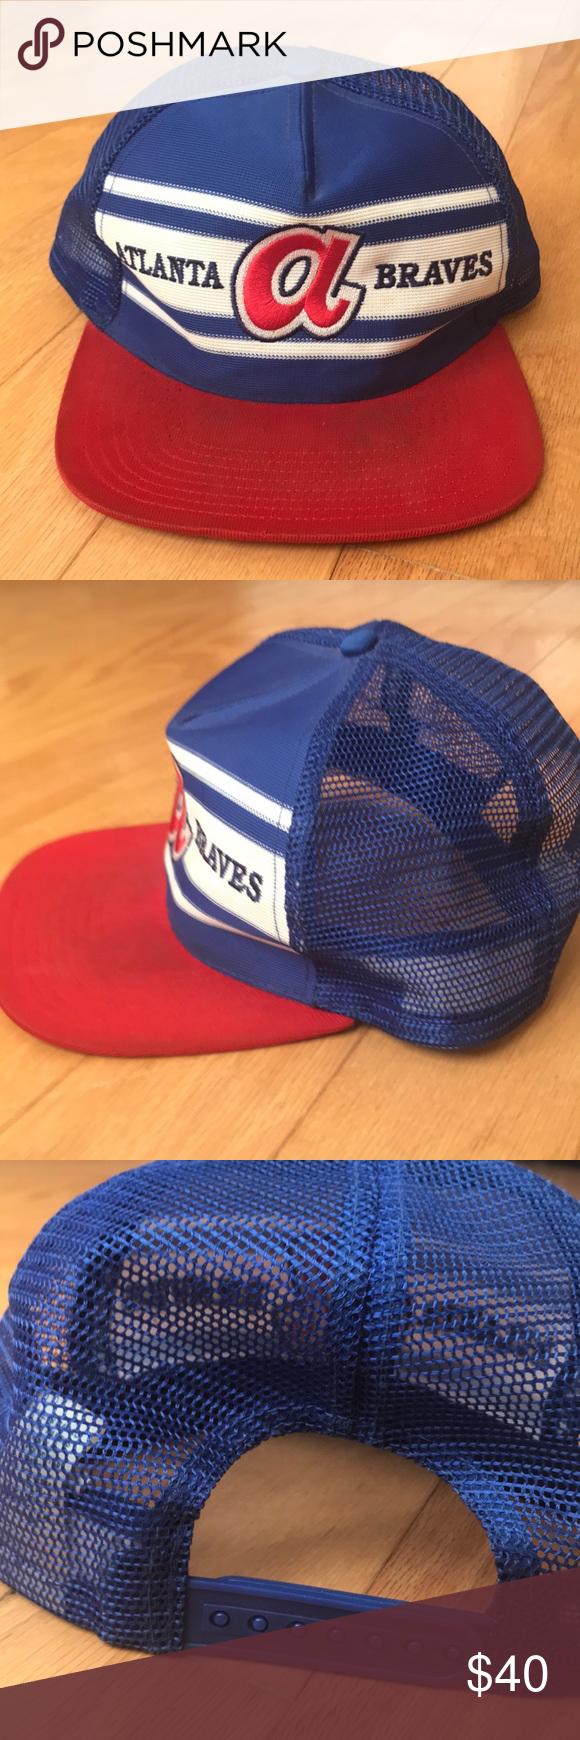 Vintage Atlanta Braves Baseball Hat Rare 70 80s Atlanta Braves Baseball Baseball Hats Atlanta Braves